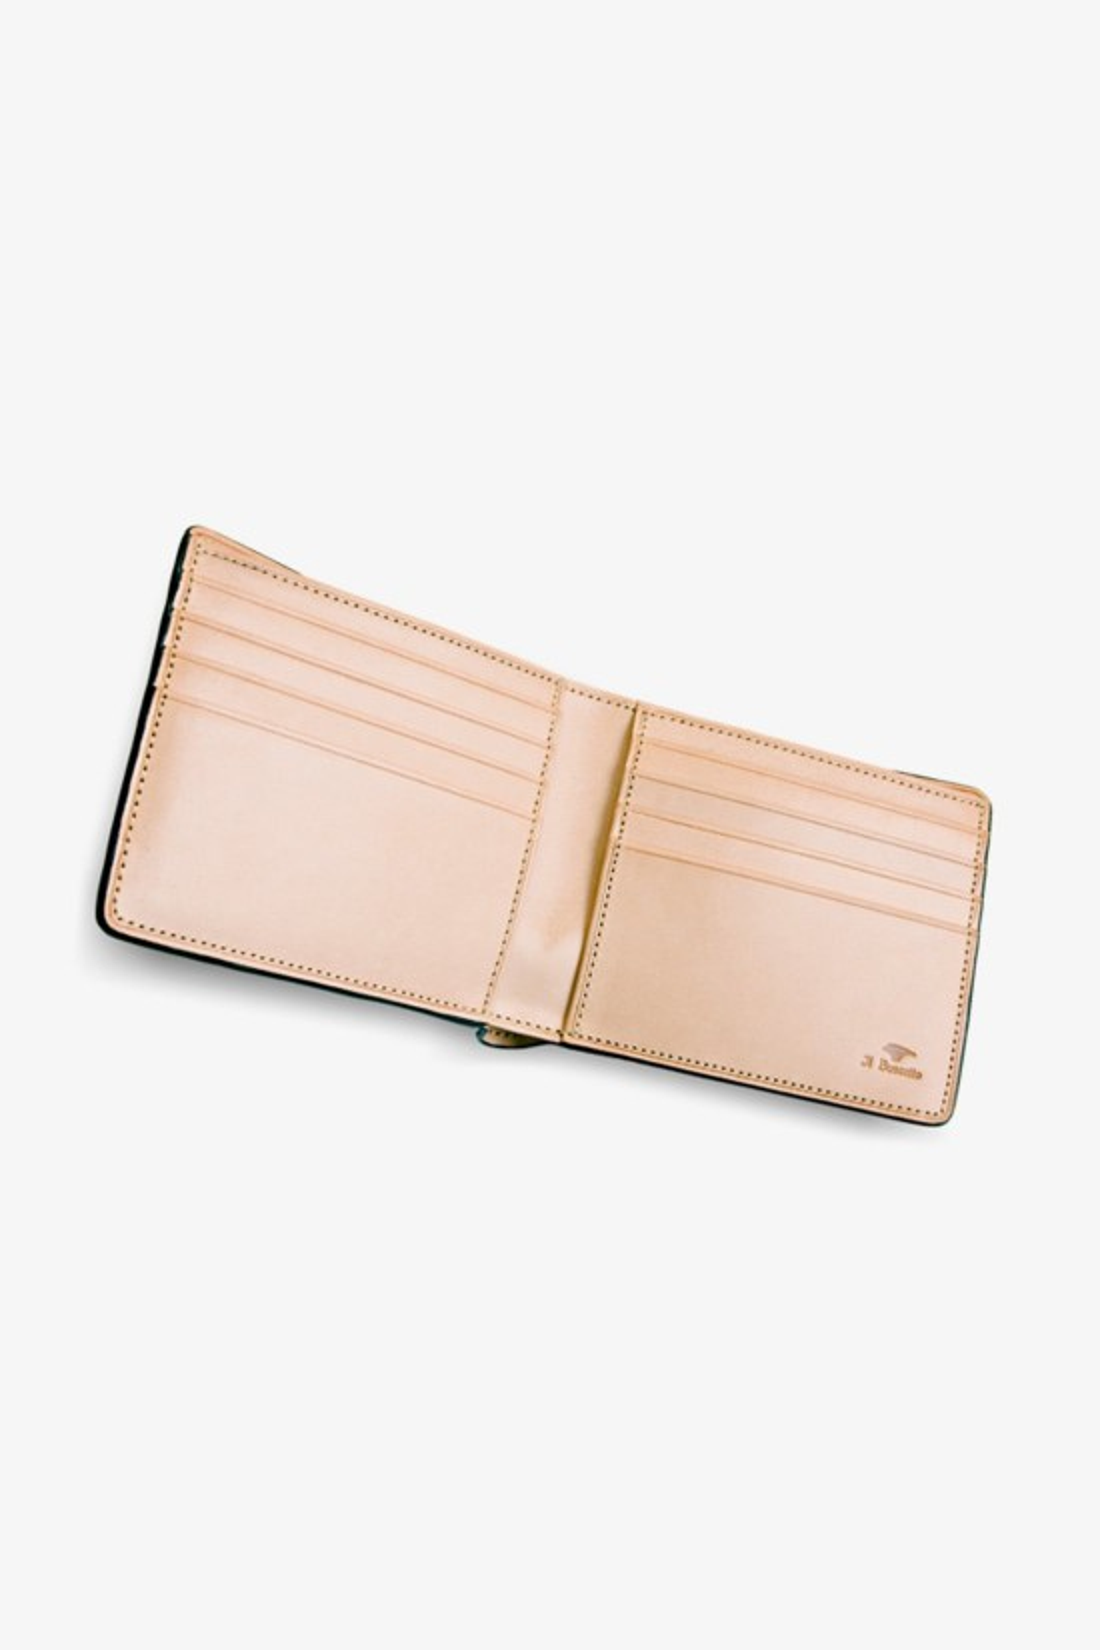 IL BUSSETTO / Bi-fold wallet w/ 8 card slots Black